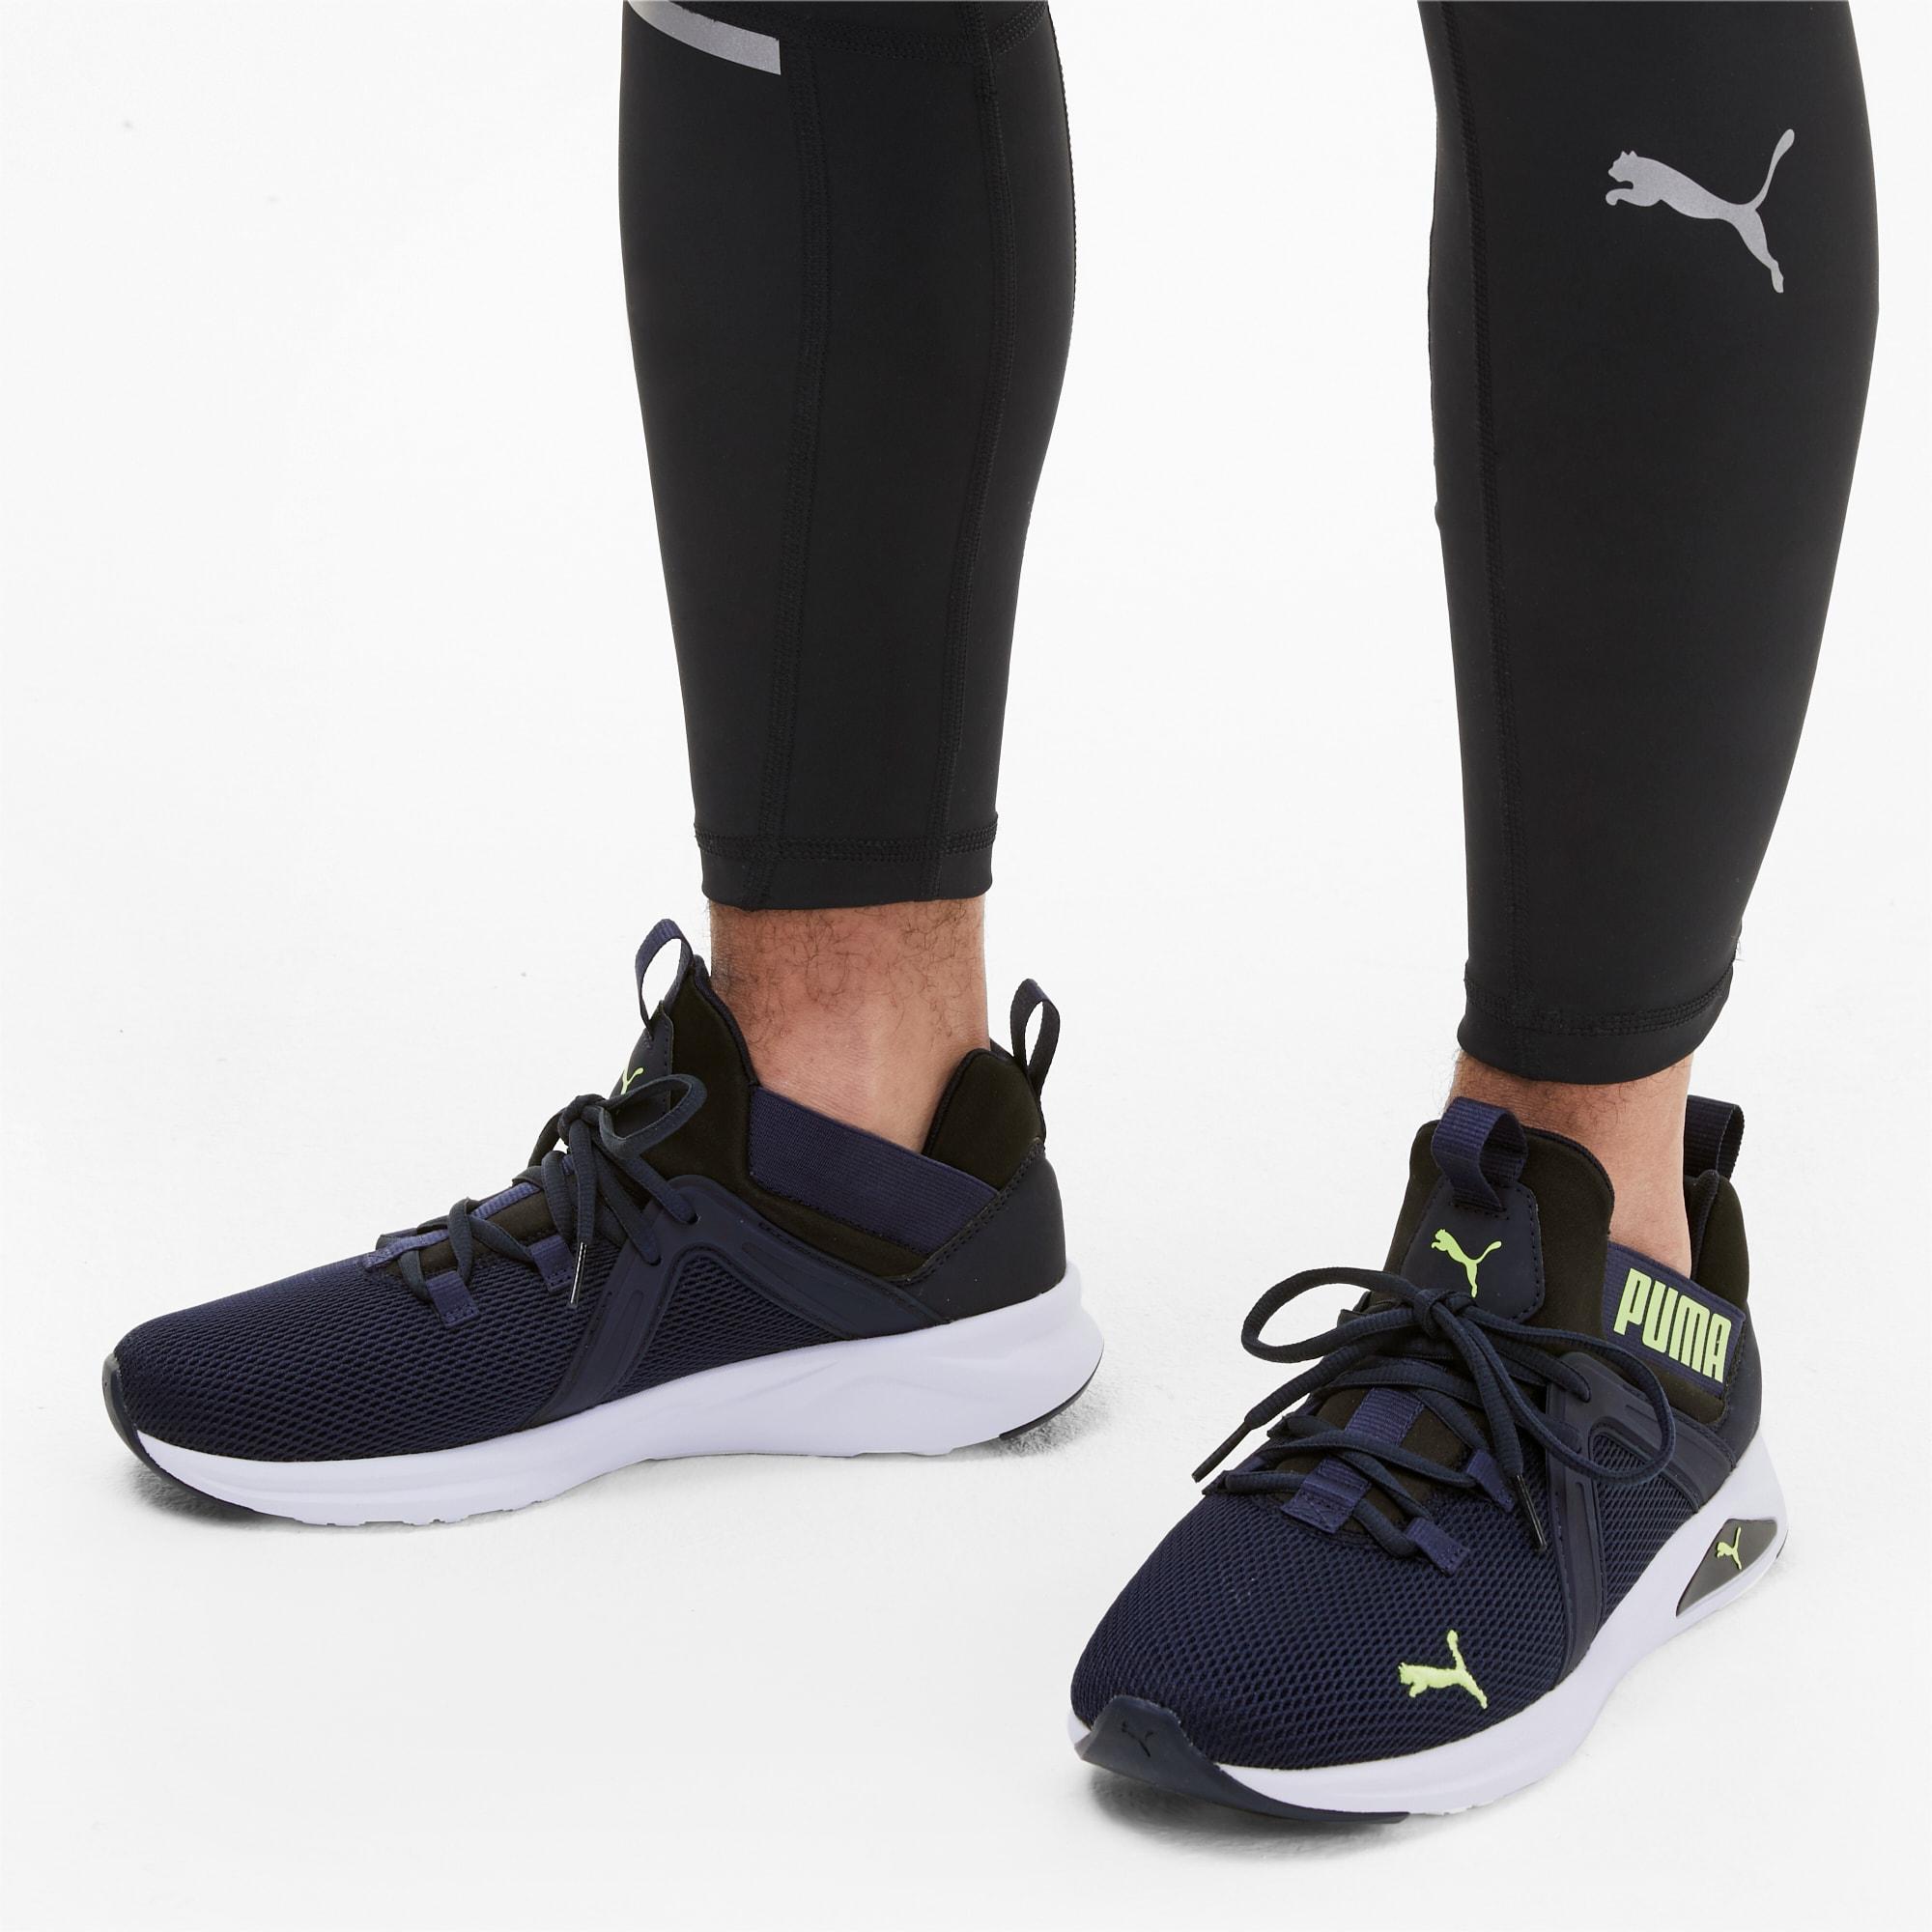 Enzo 2 Wide Men's Training Shoes